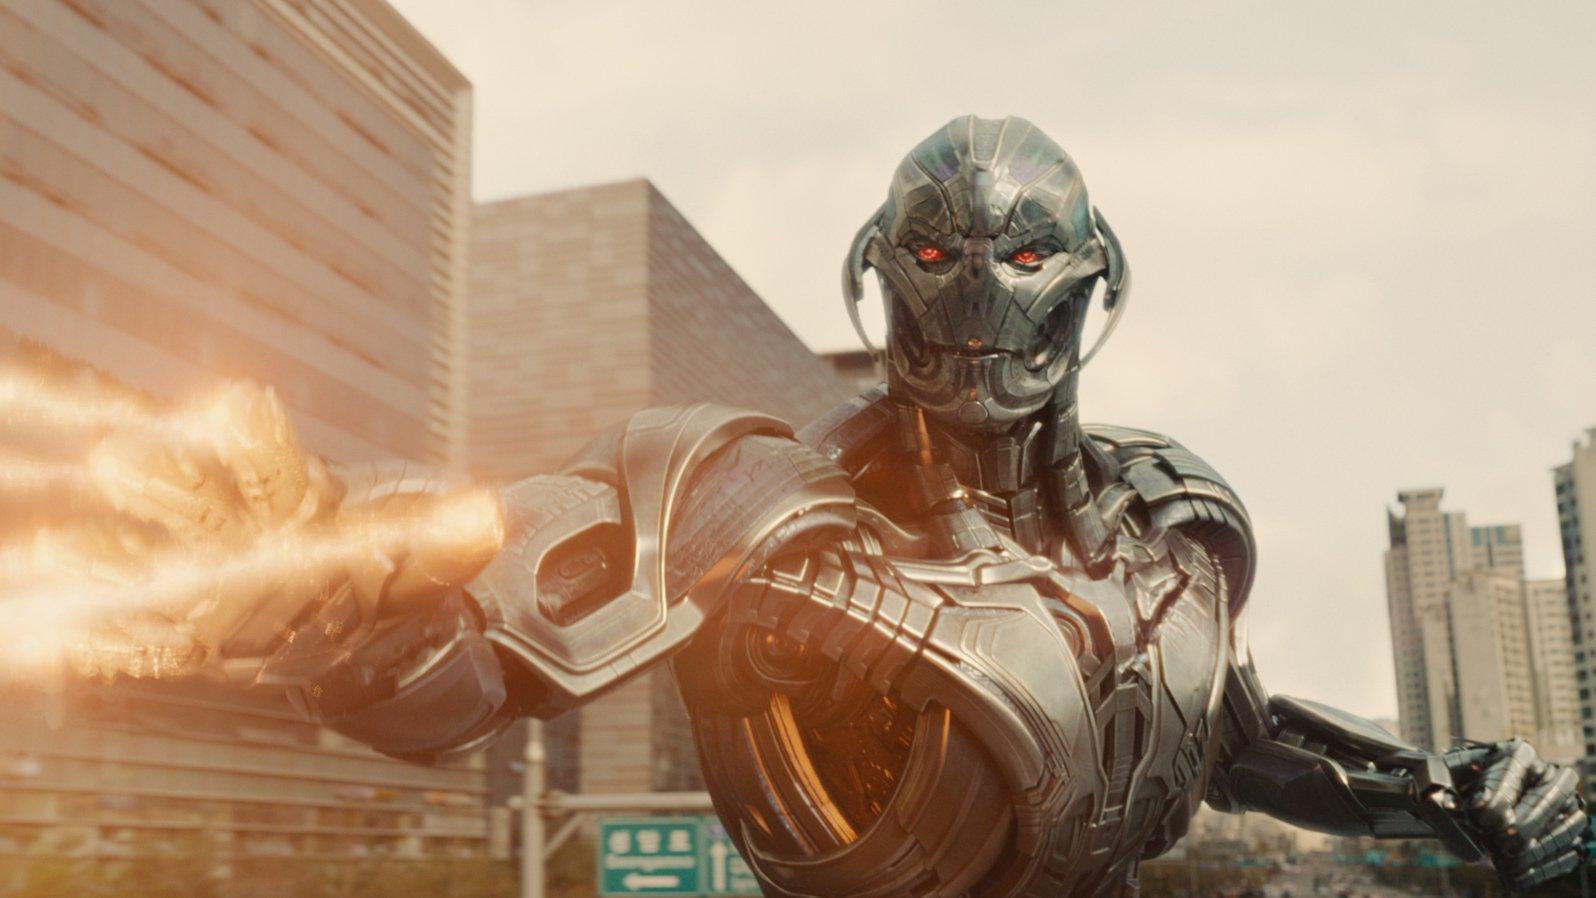 Avengers: Age of Ultron backdrop